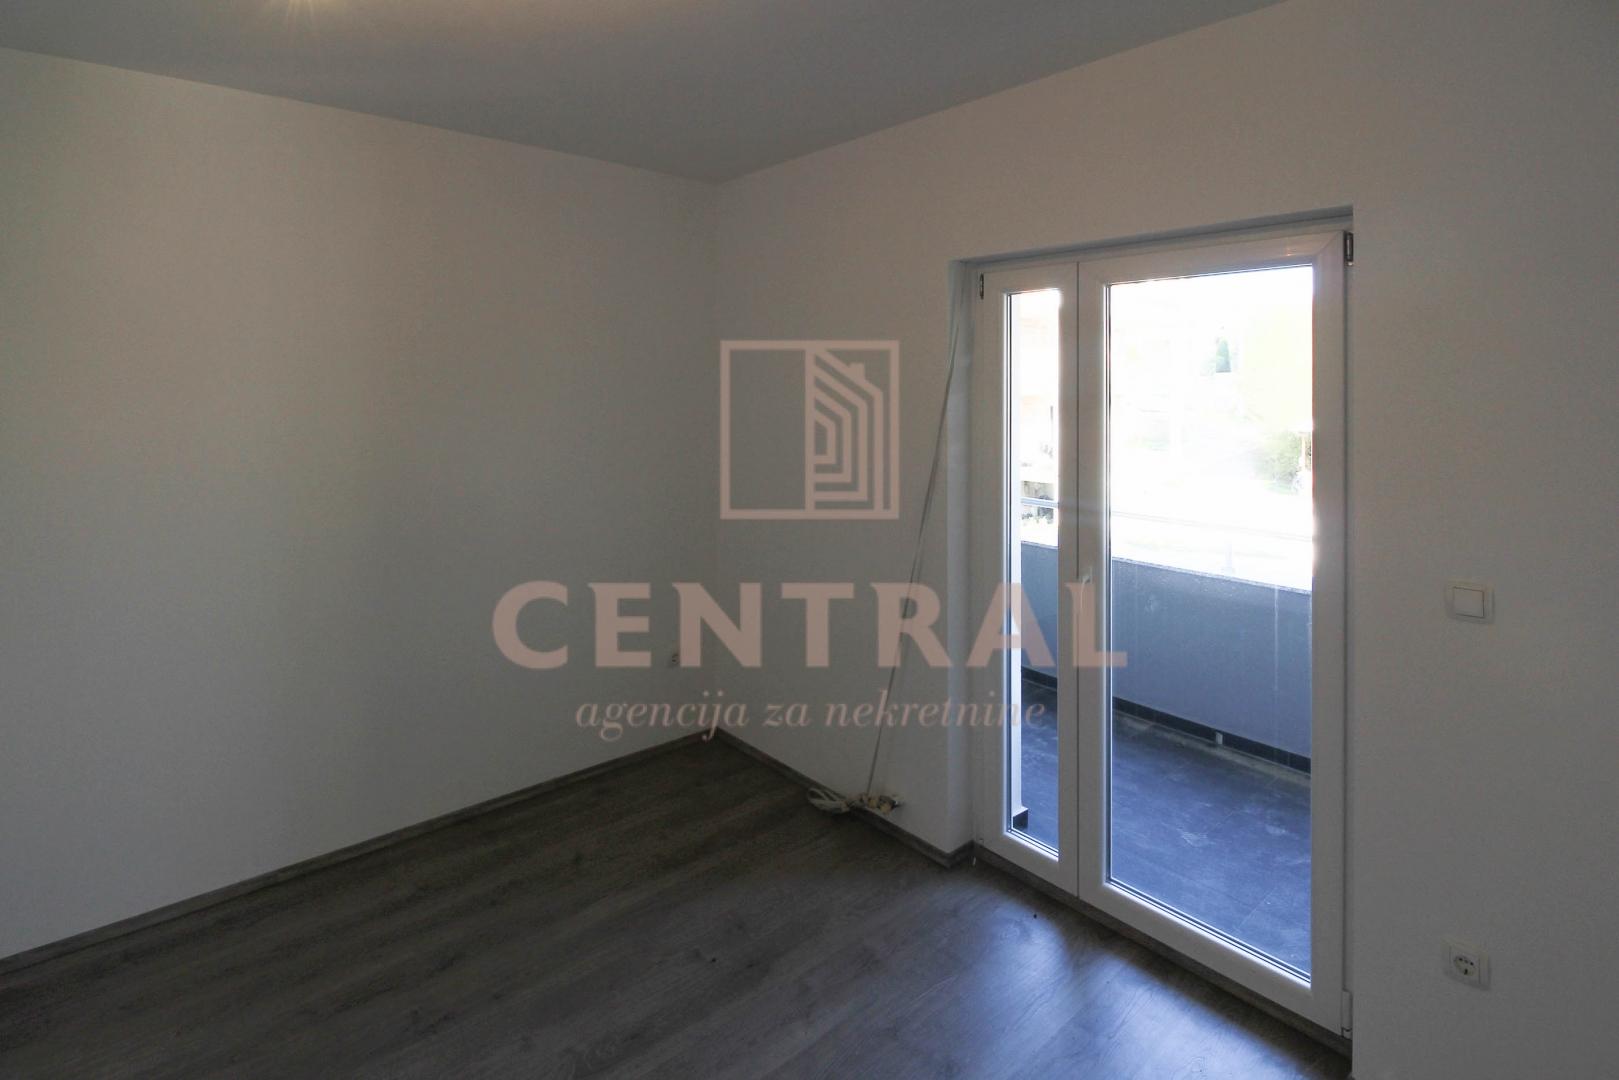 Viškovo, dvoetažni četverosoban stan s dnevnim boravkom, 101 m2